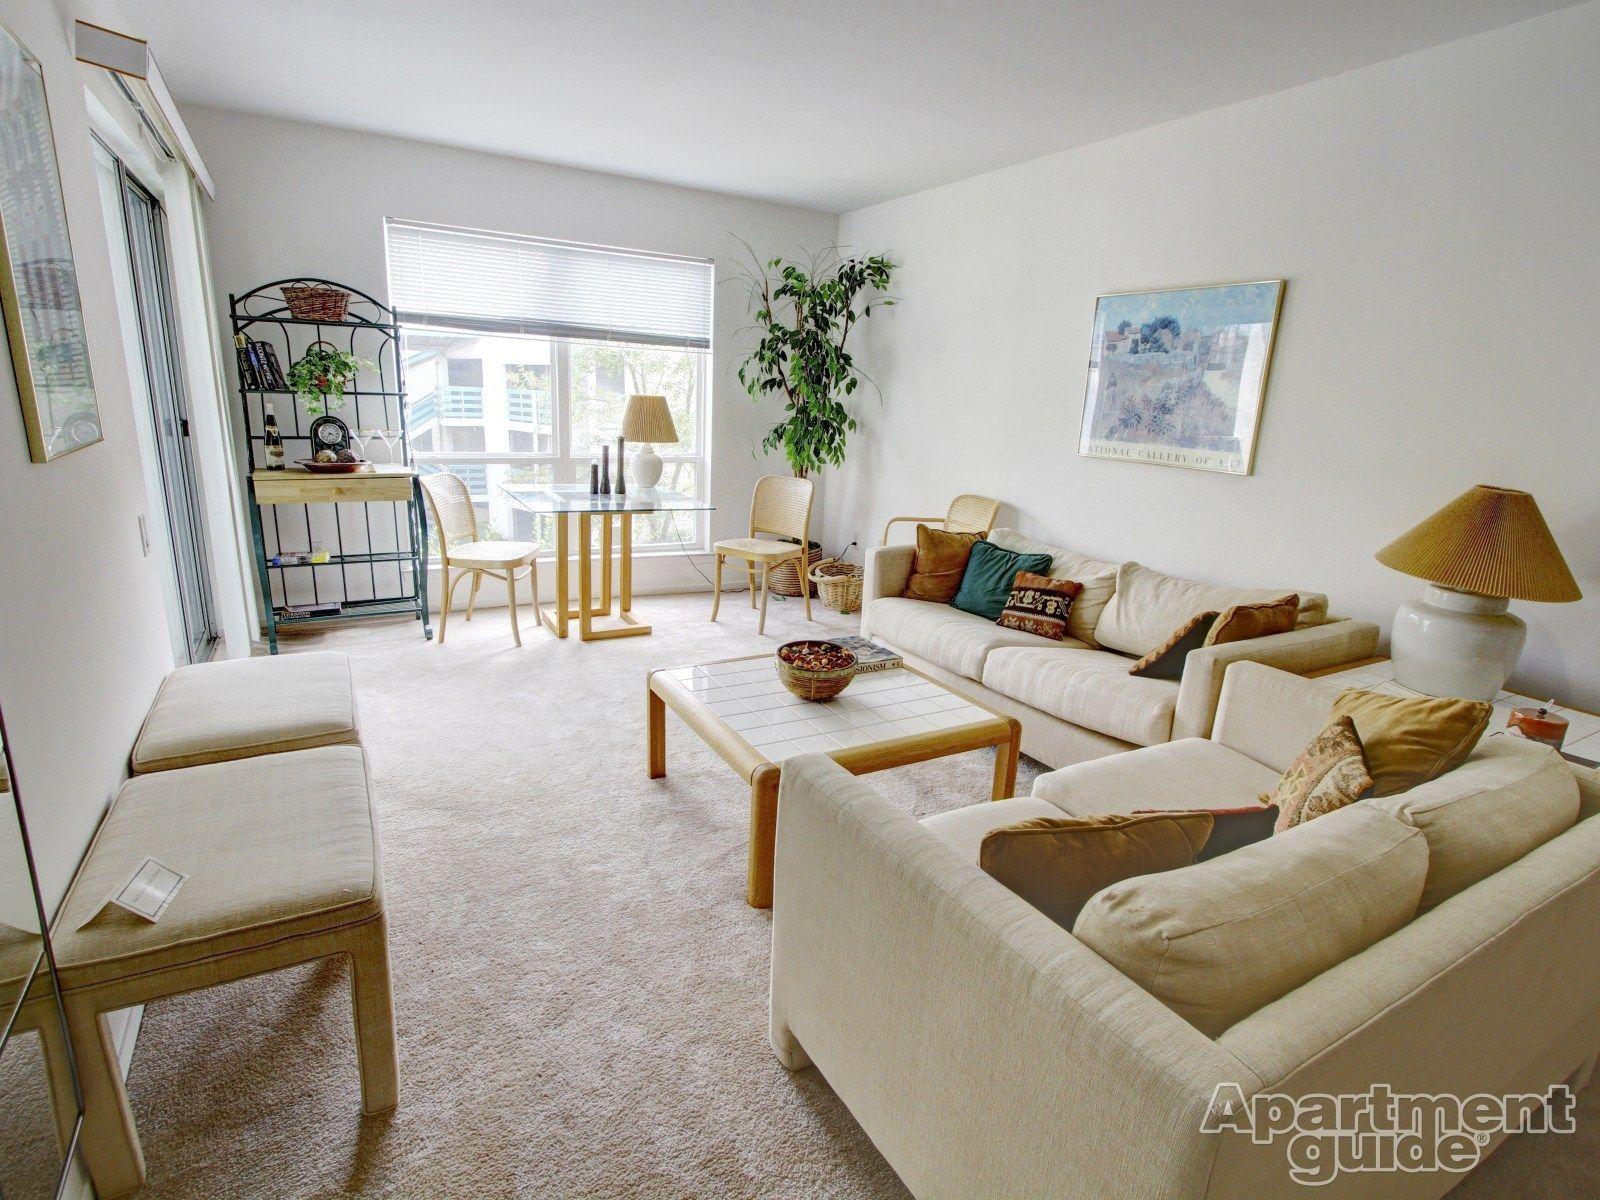 Richland Creek Apartments Nashville Tn 37209 Apartments For Rent Apartments For Rent Apartment Home